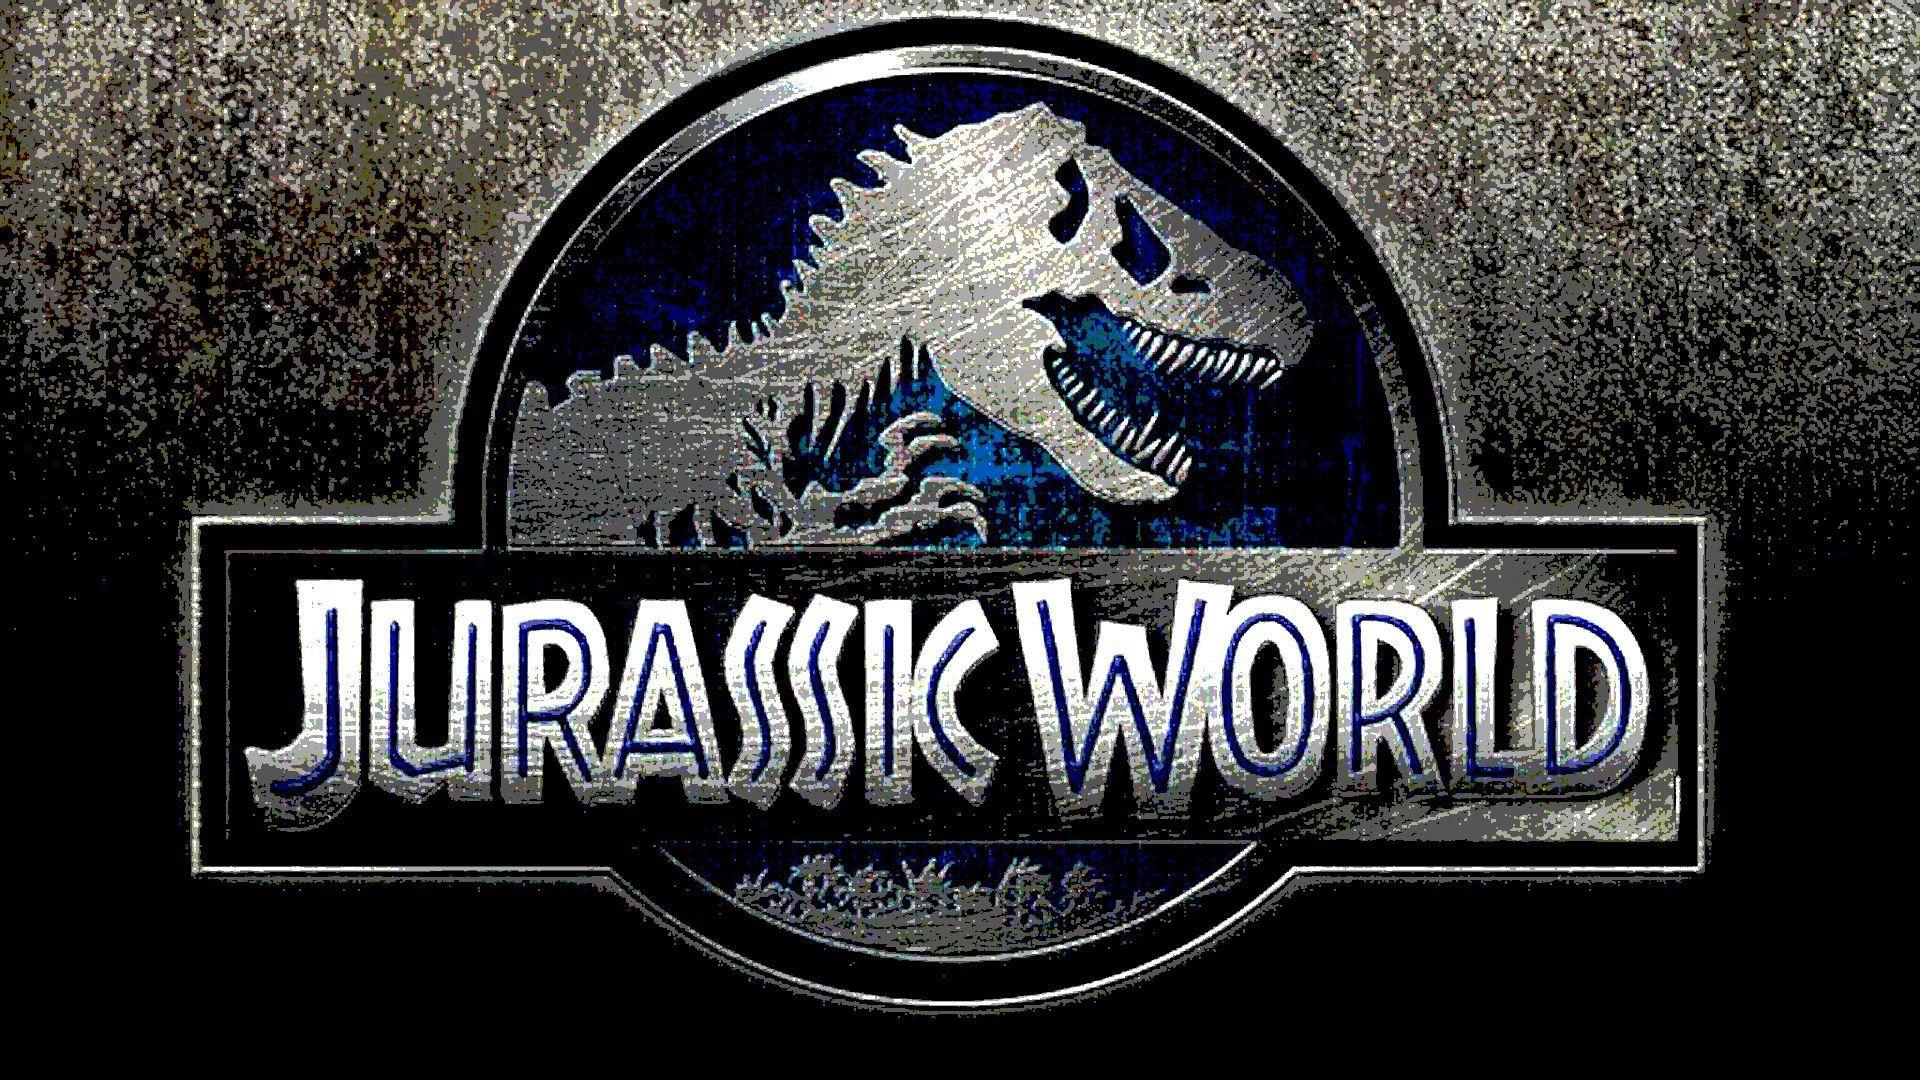 Jurassic Park movies FootsInfo